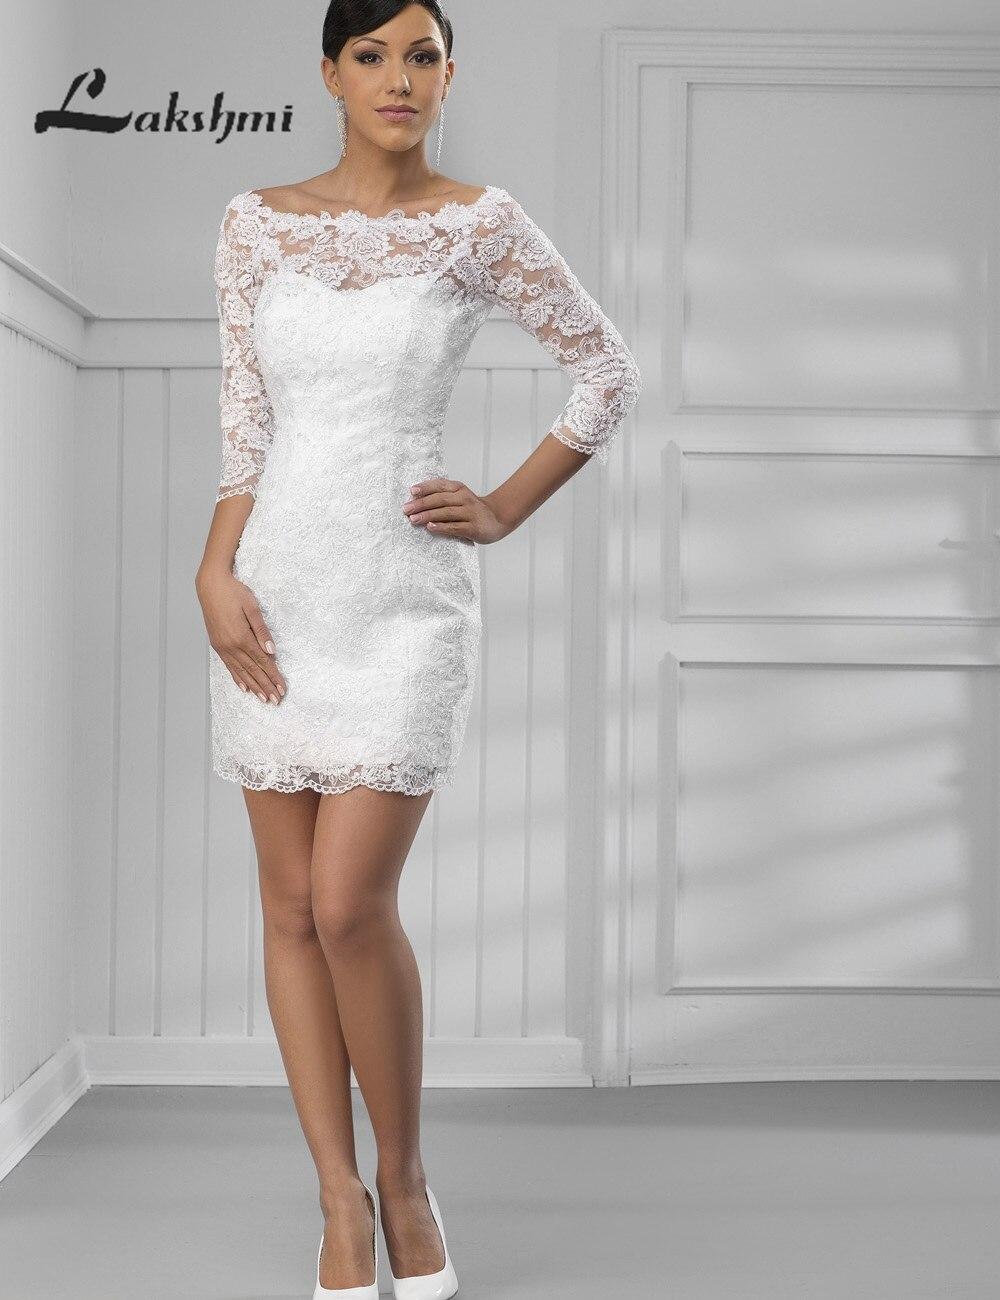 Lace Wedding Short Reception Dress